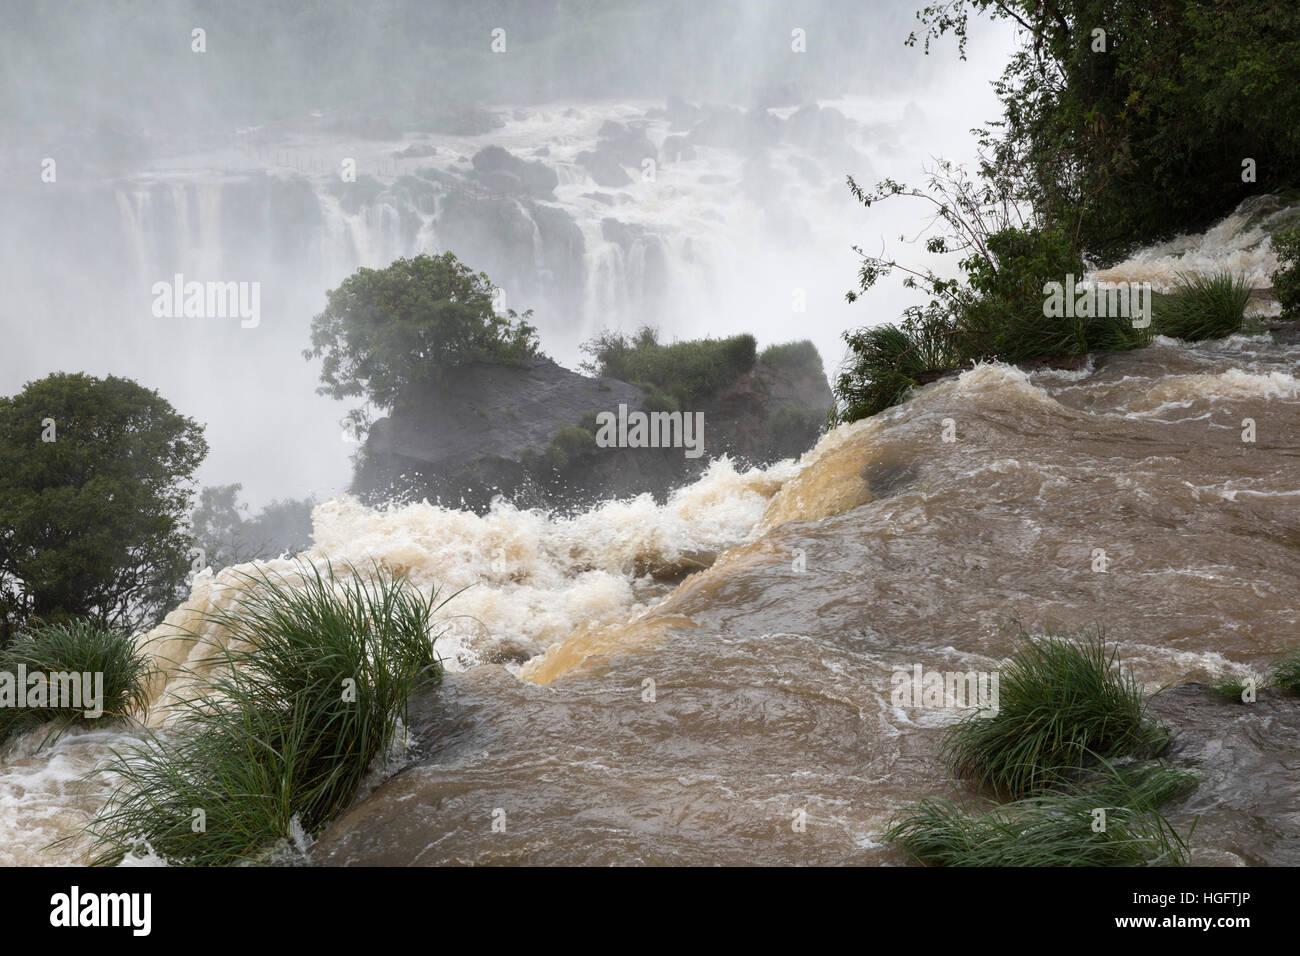 Iguazu Falls, Iguazu National Park, Misiones Province, The Northeast, Argentina, South America - Stock Image